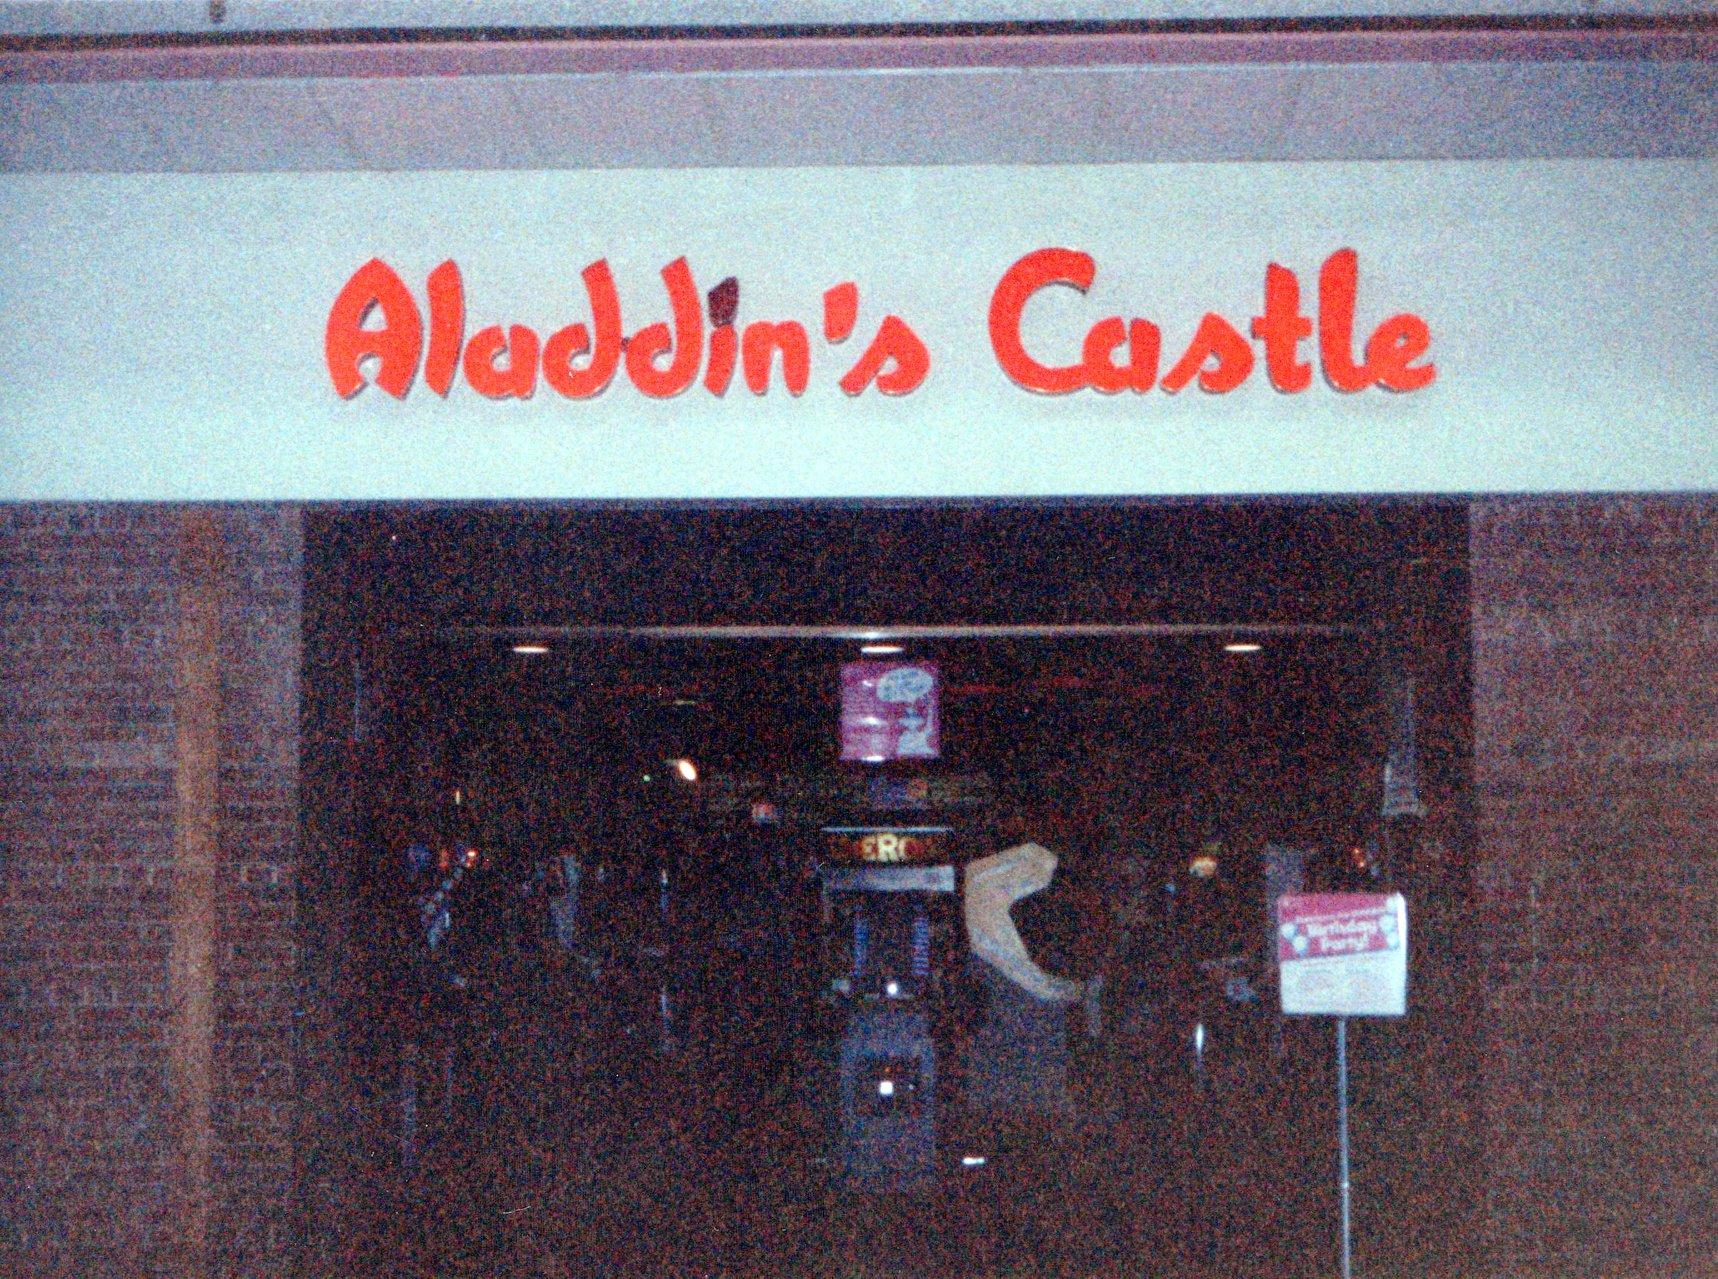 Aladdins Castle storefront